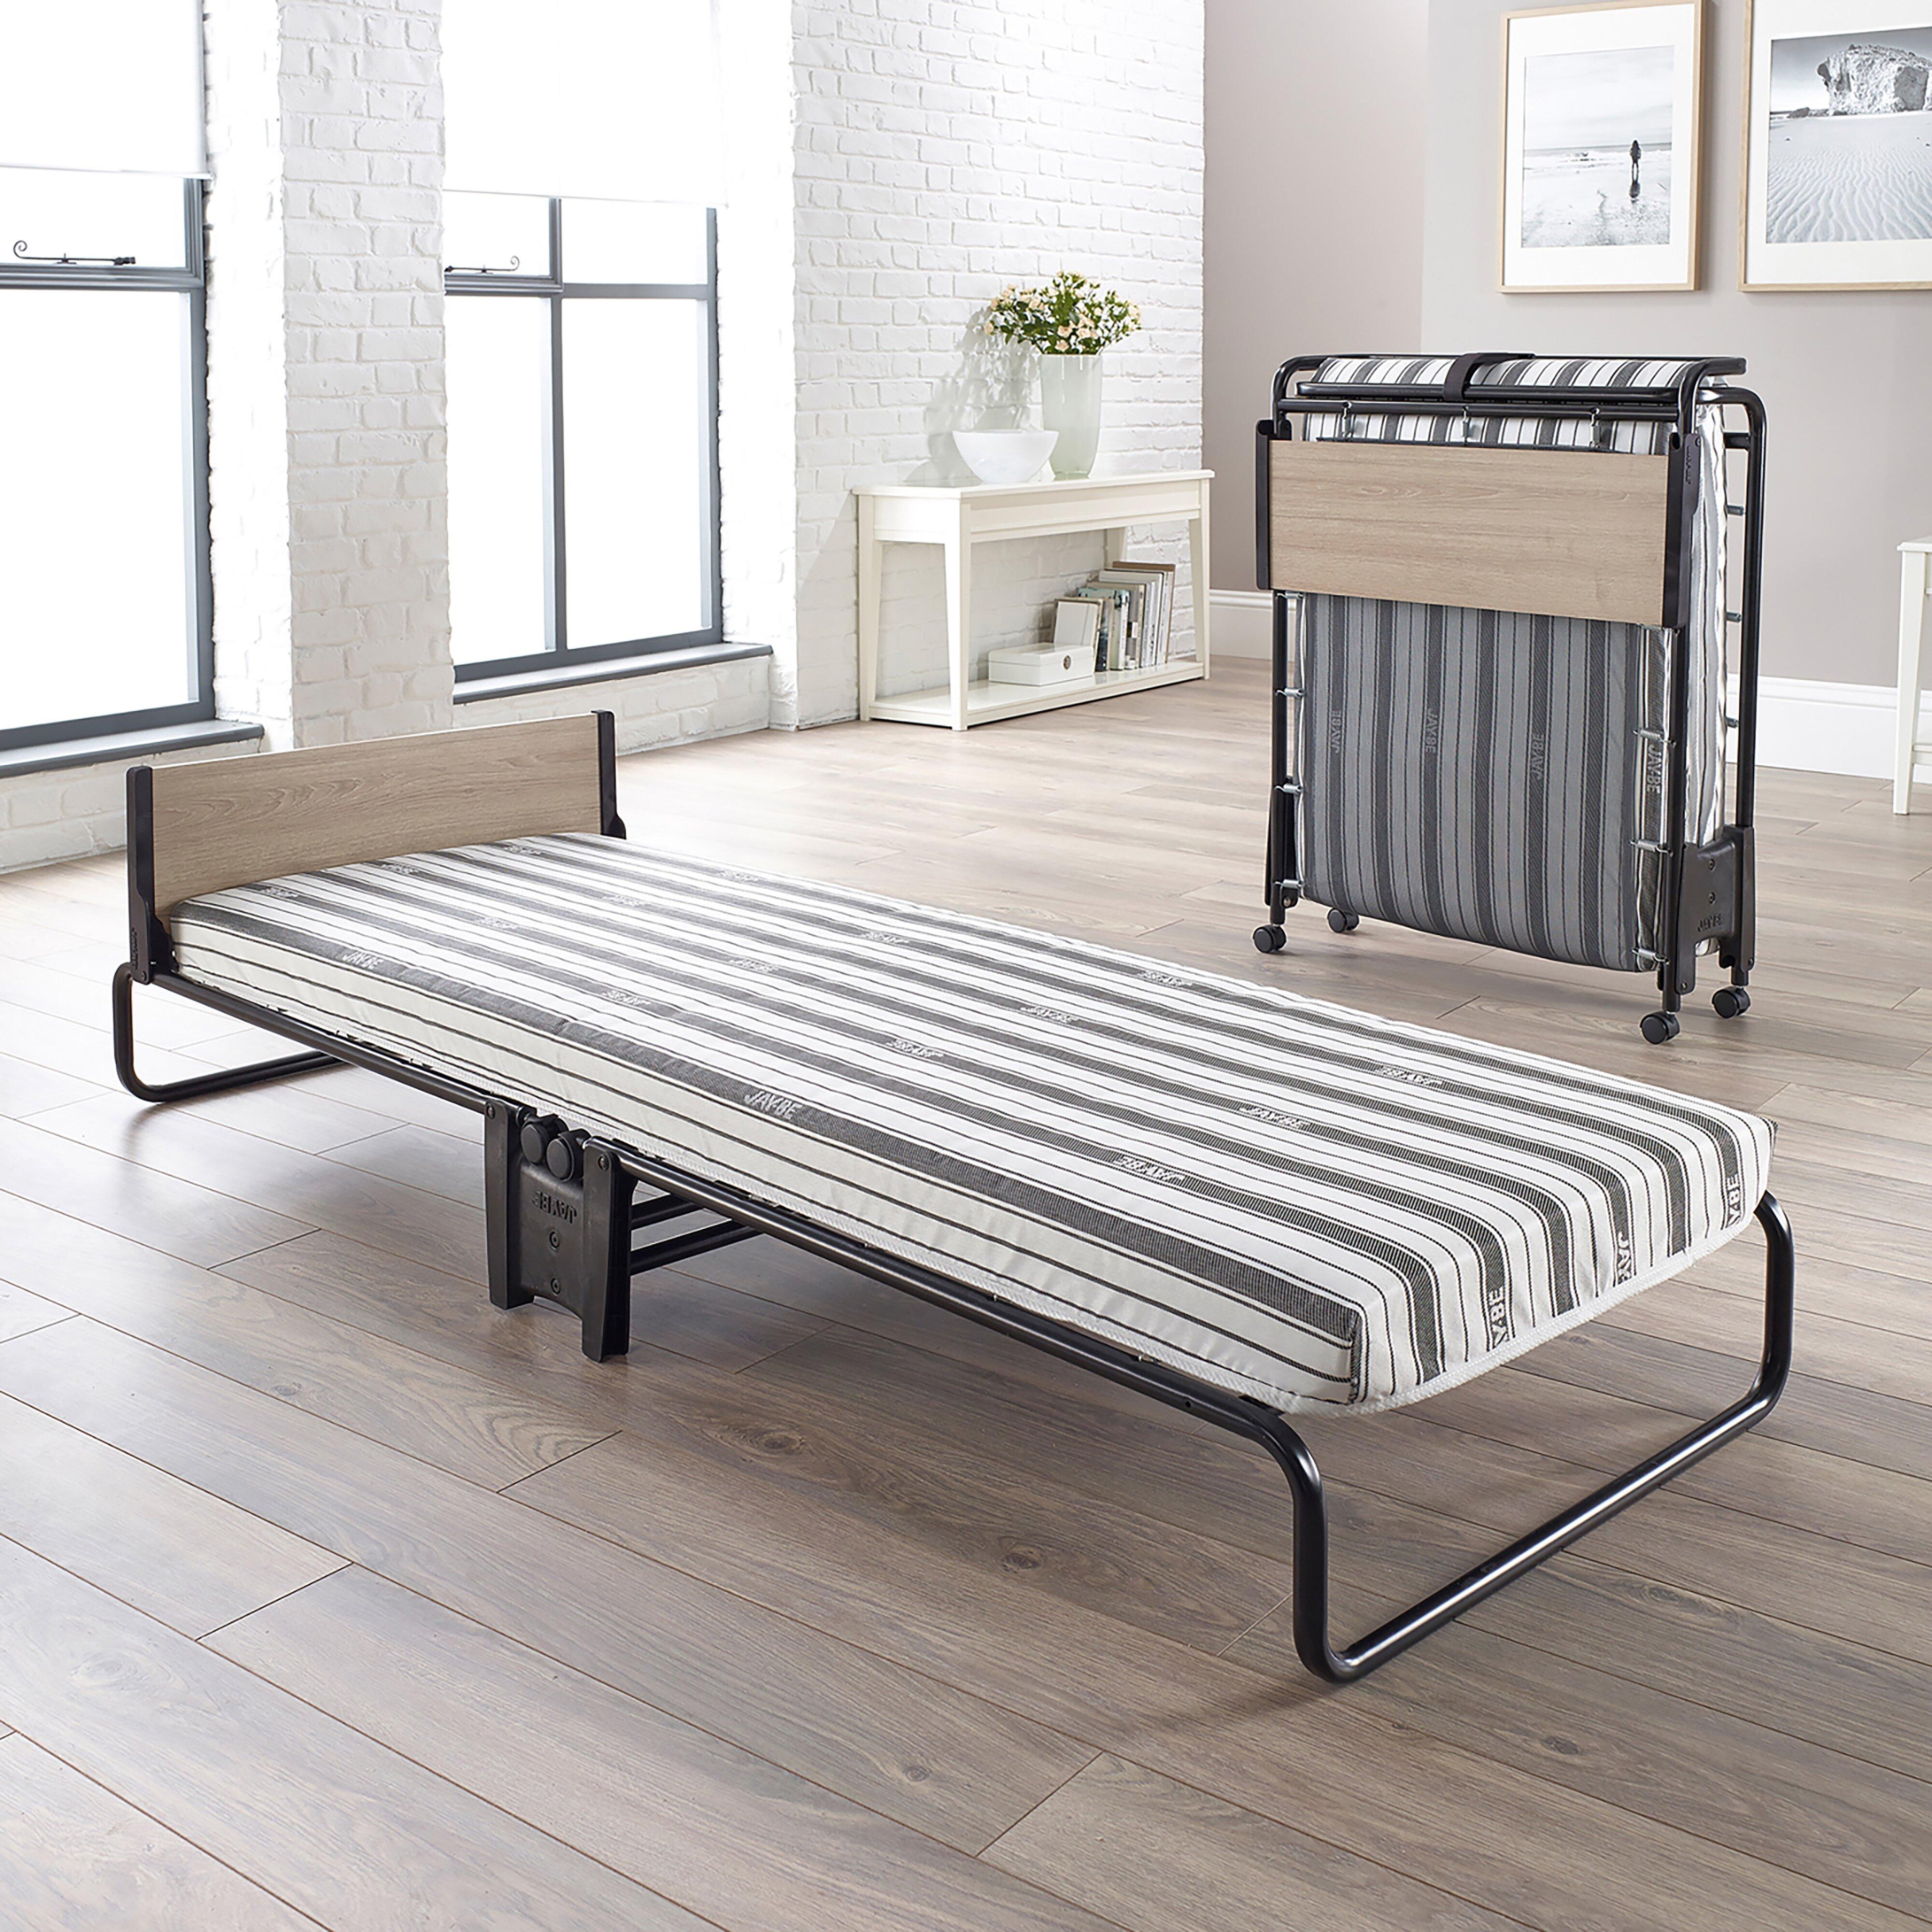 Folding Beds Reviews : Jay be revolution folding bed reviews wayfair uk